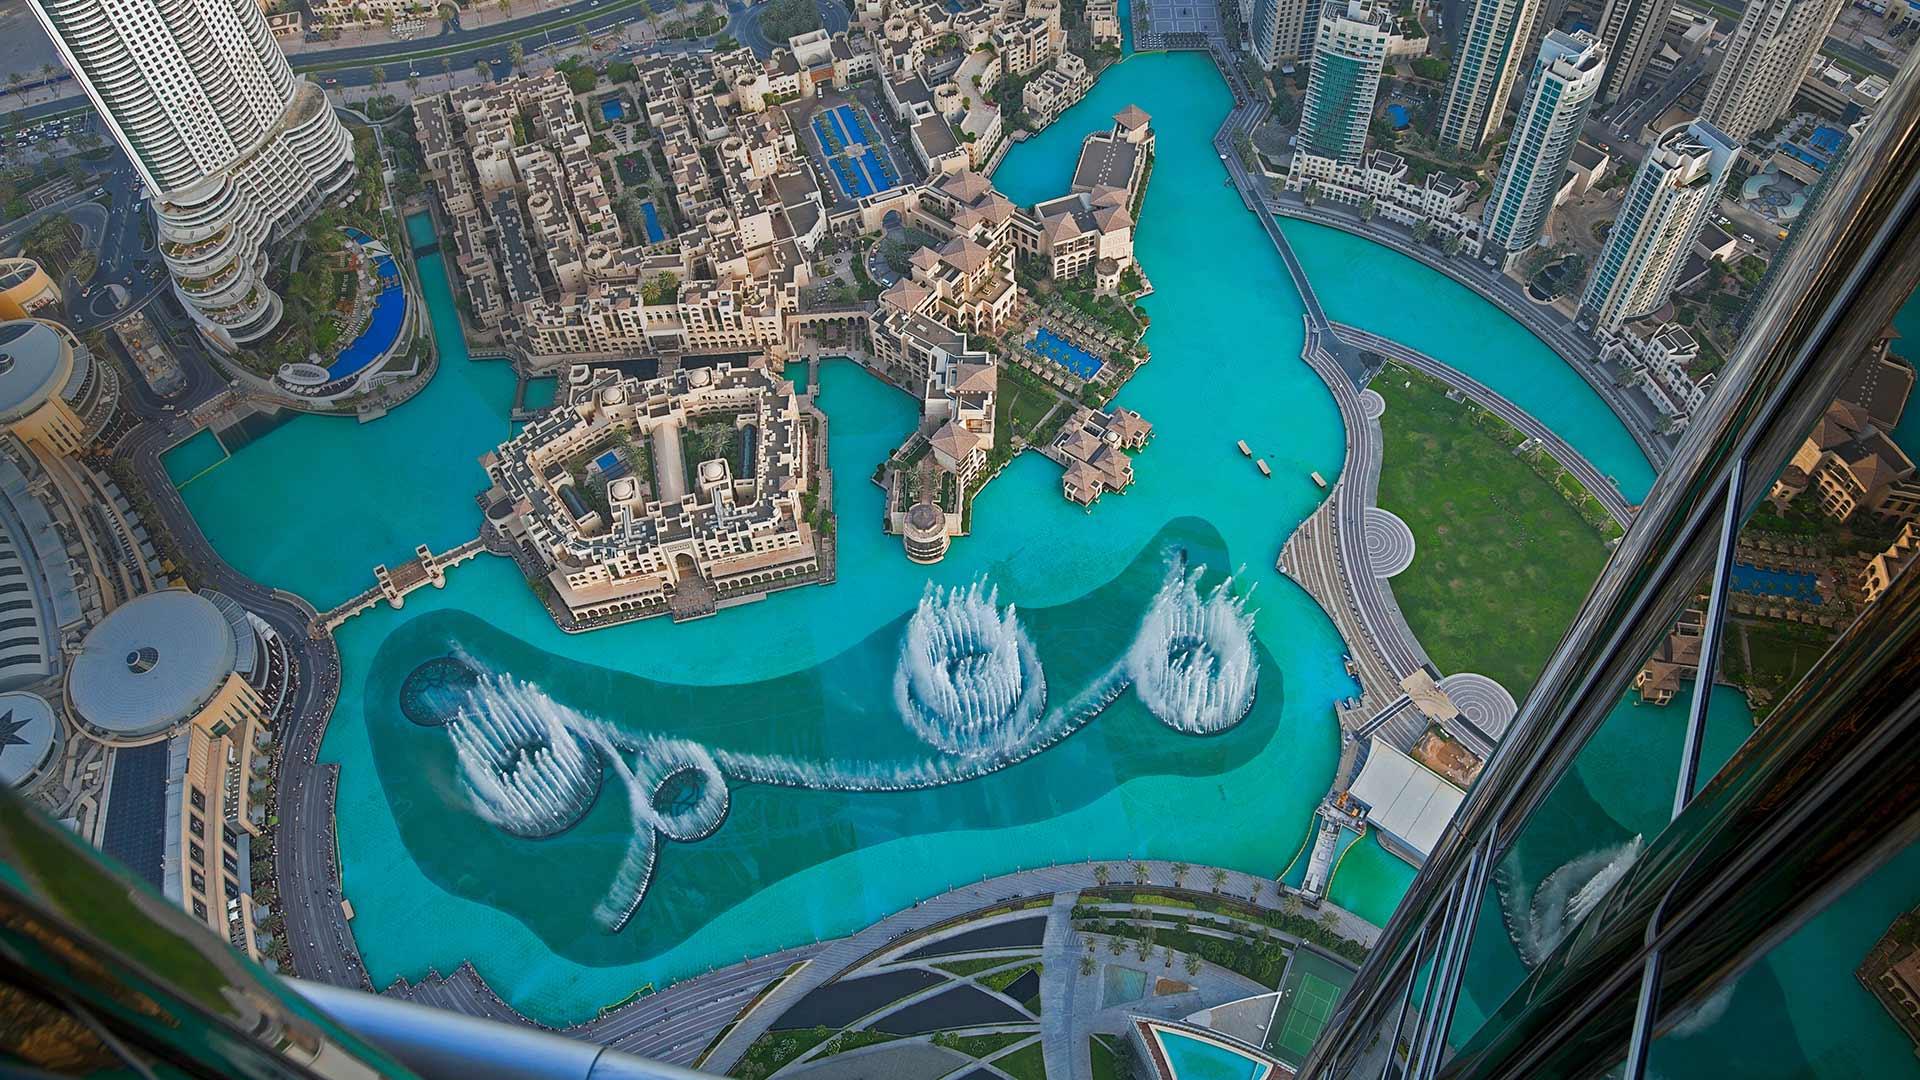 The Dubai Fountain in Burj Lake, taken from the Burj Khalifa in Dubai, United Arab Emirates (© Eli Asenova/Getty Images)(Bing United States)